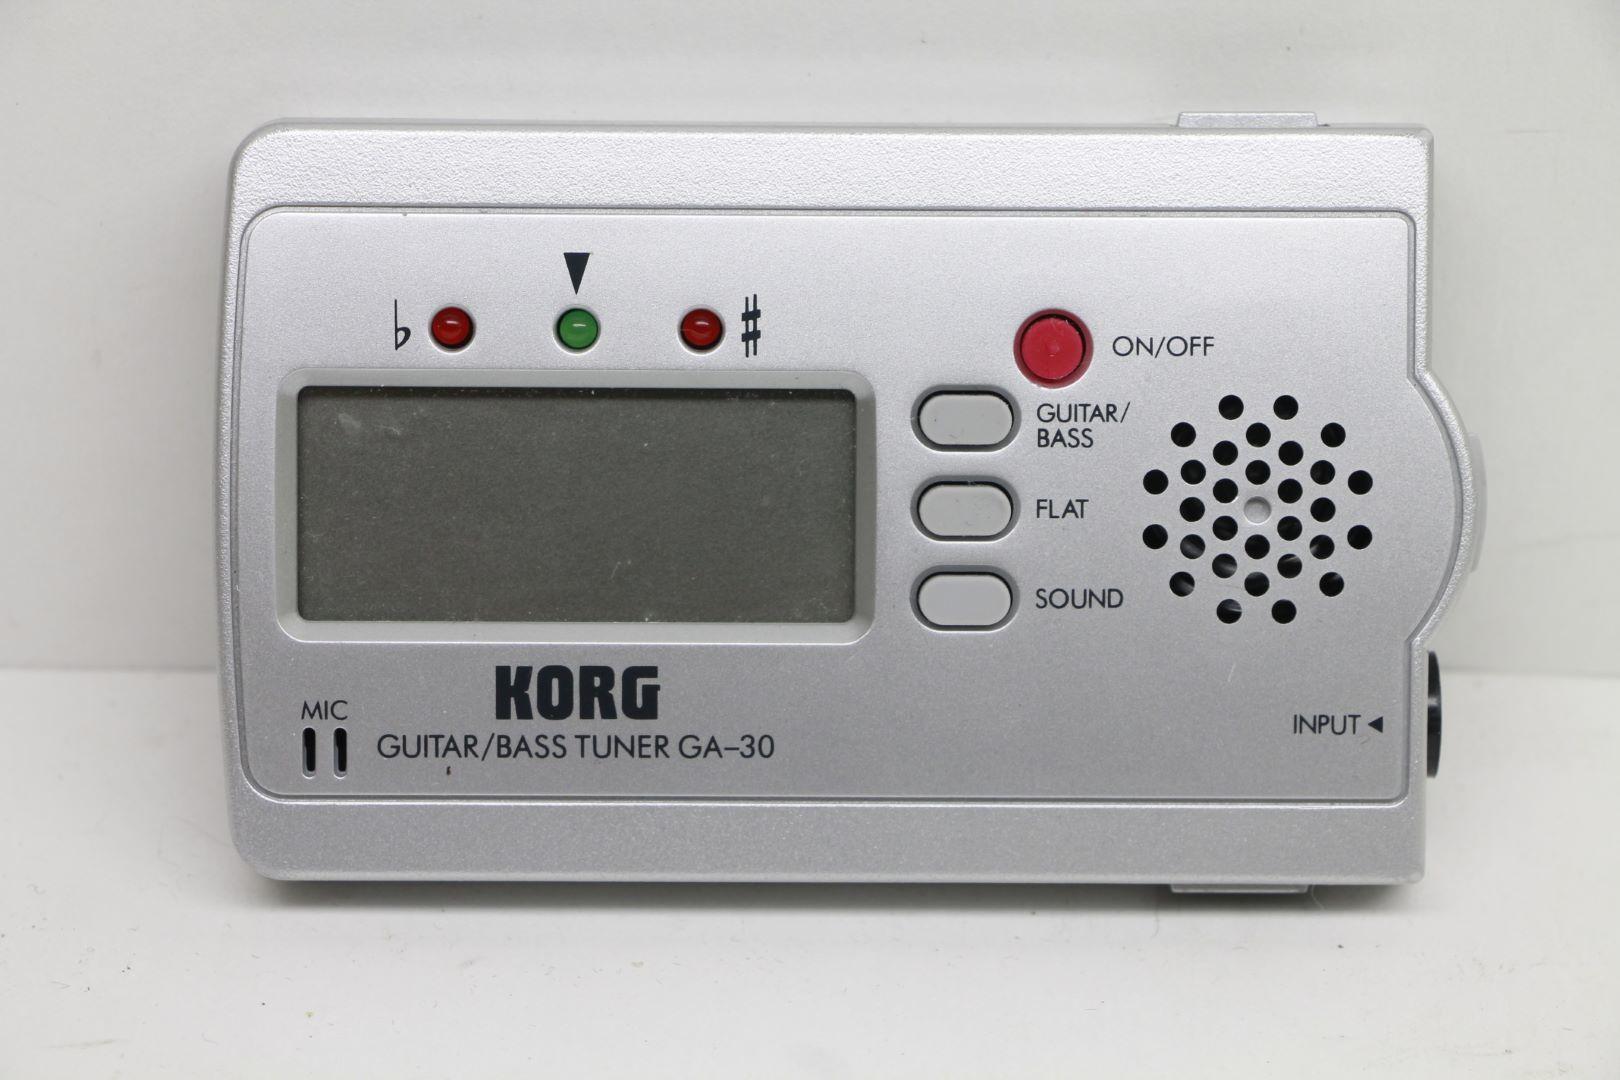 6B006FAC-1366-C040-9546-9D8CA1CB0235_1.png